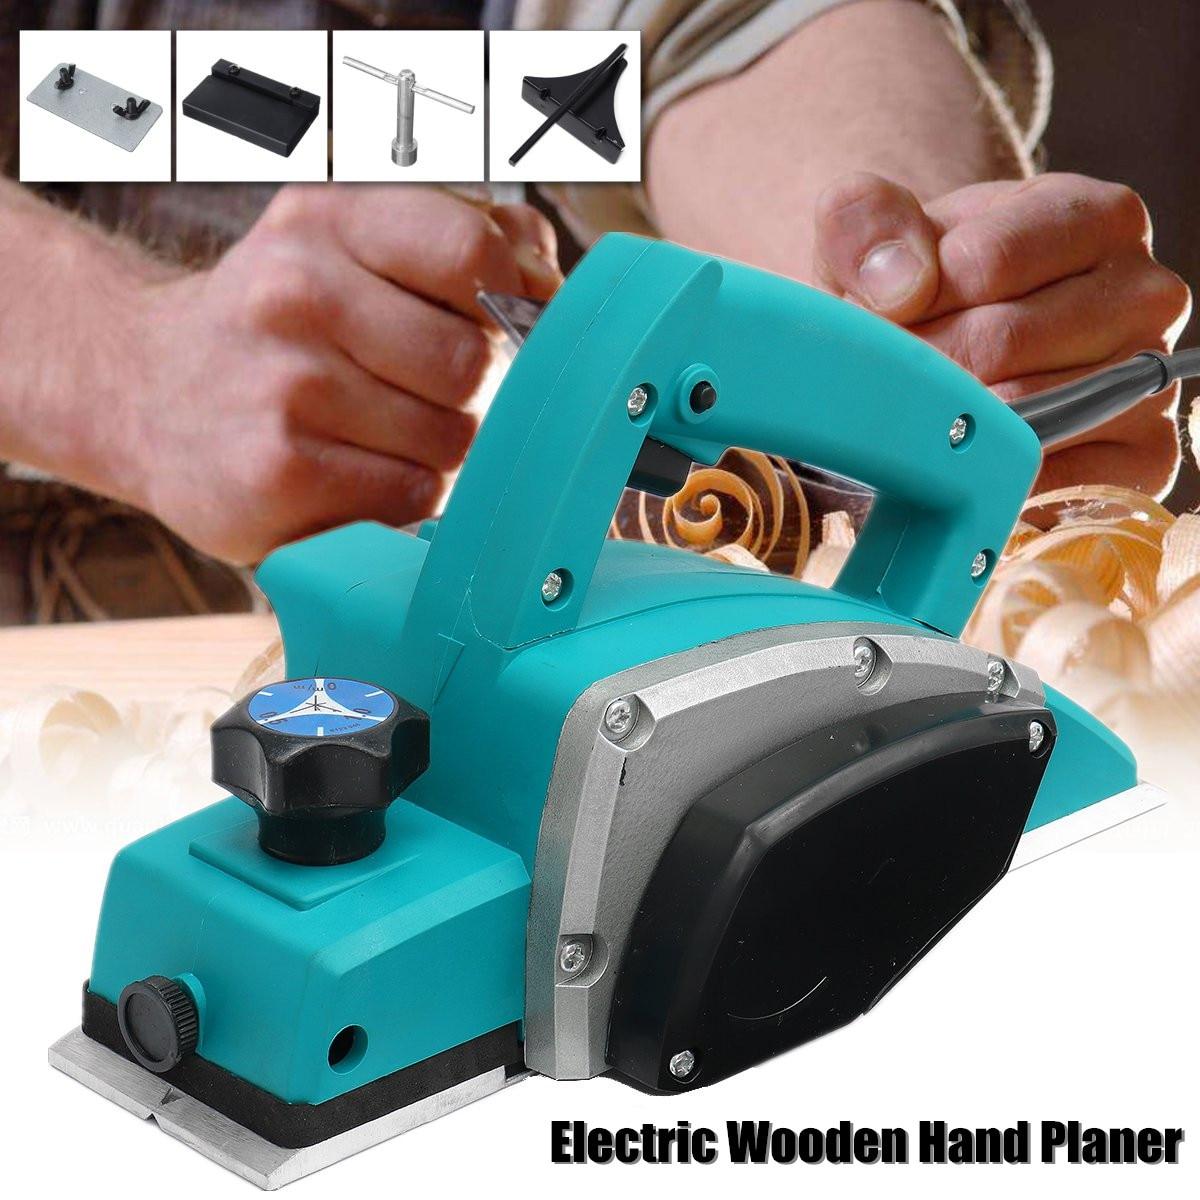 220V/110V 1000W Electric Planer Powerful Wooden Handheld Planer Carpenter Woodworking File Tool Home DIY Power Tools Kit